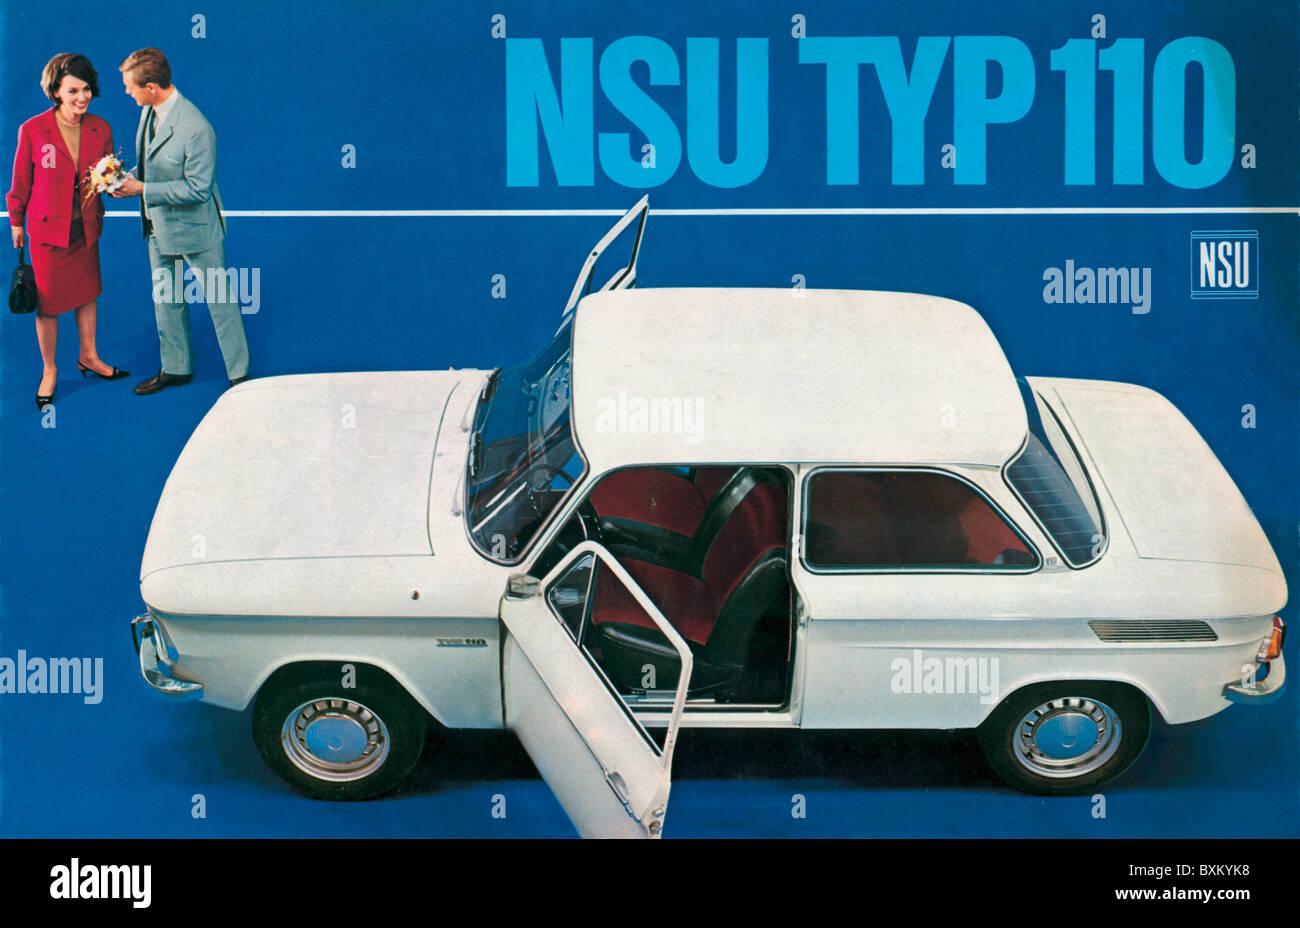 transport / transportation, car, vehicle variants, NSU Typ 110, made by NSU Werke Aktiengesellschaft Neckarsulm, - Stock Image